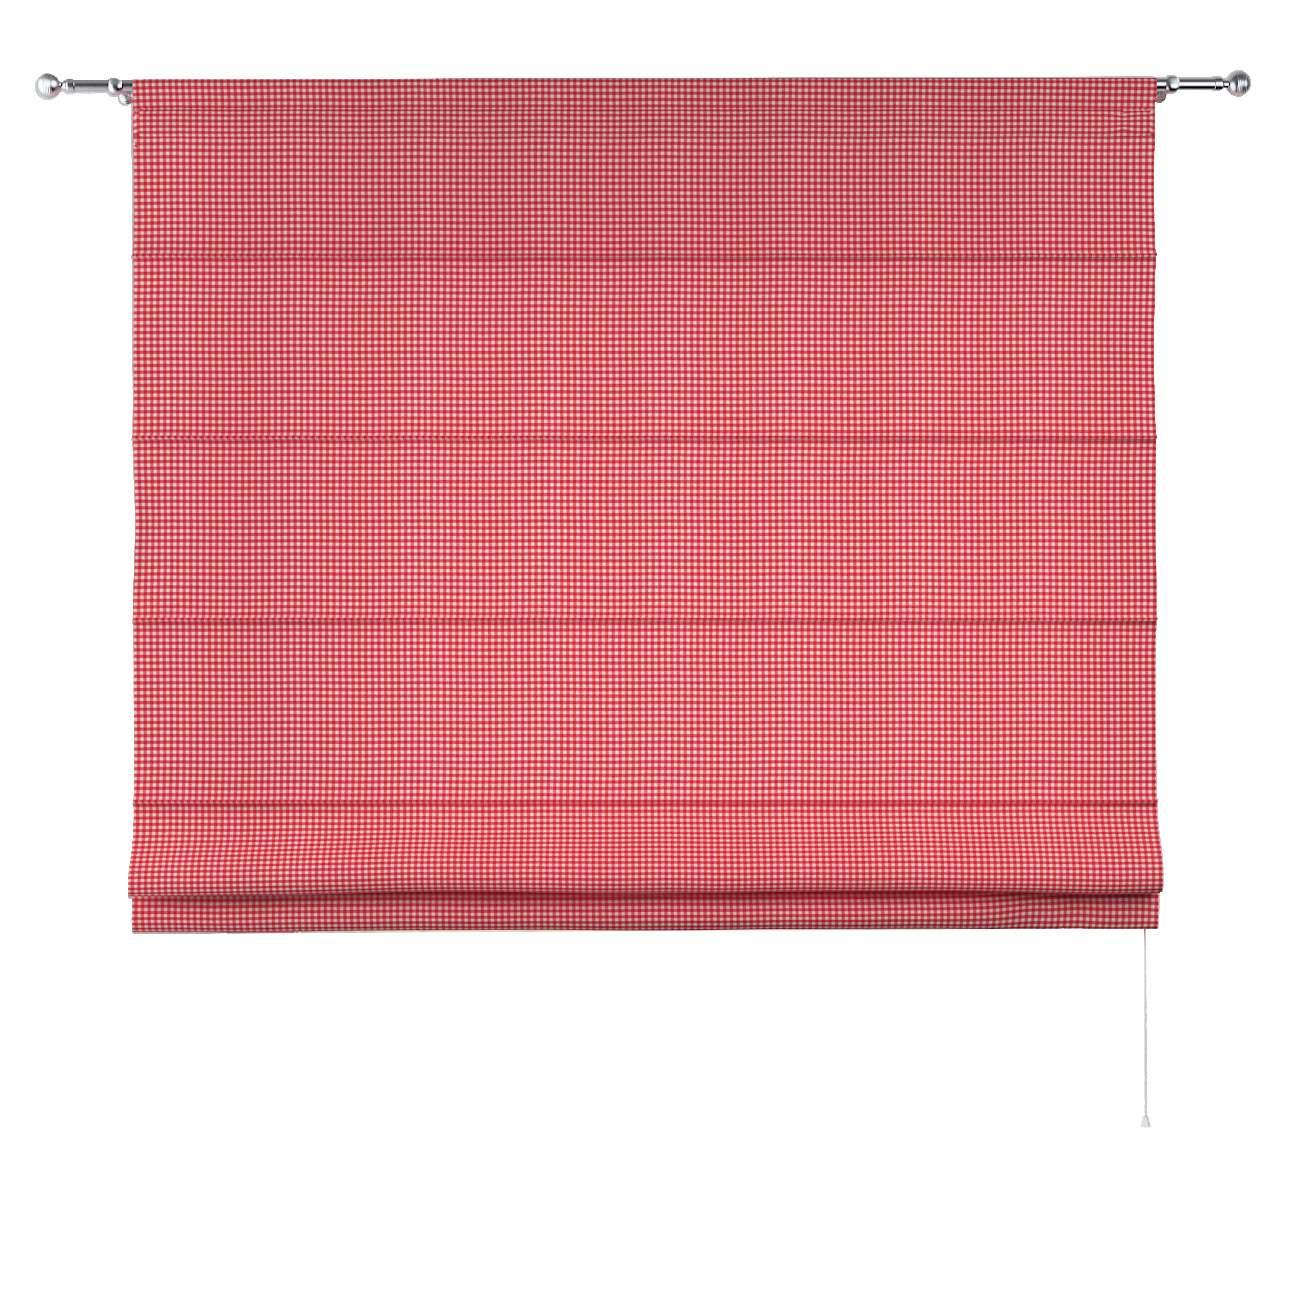 Rímska roleta Torino V kolekcii Quadro, tkanina: 136-15